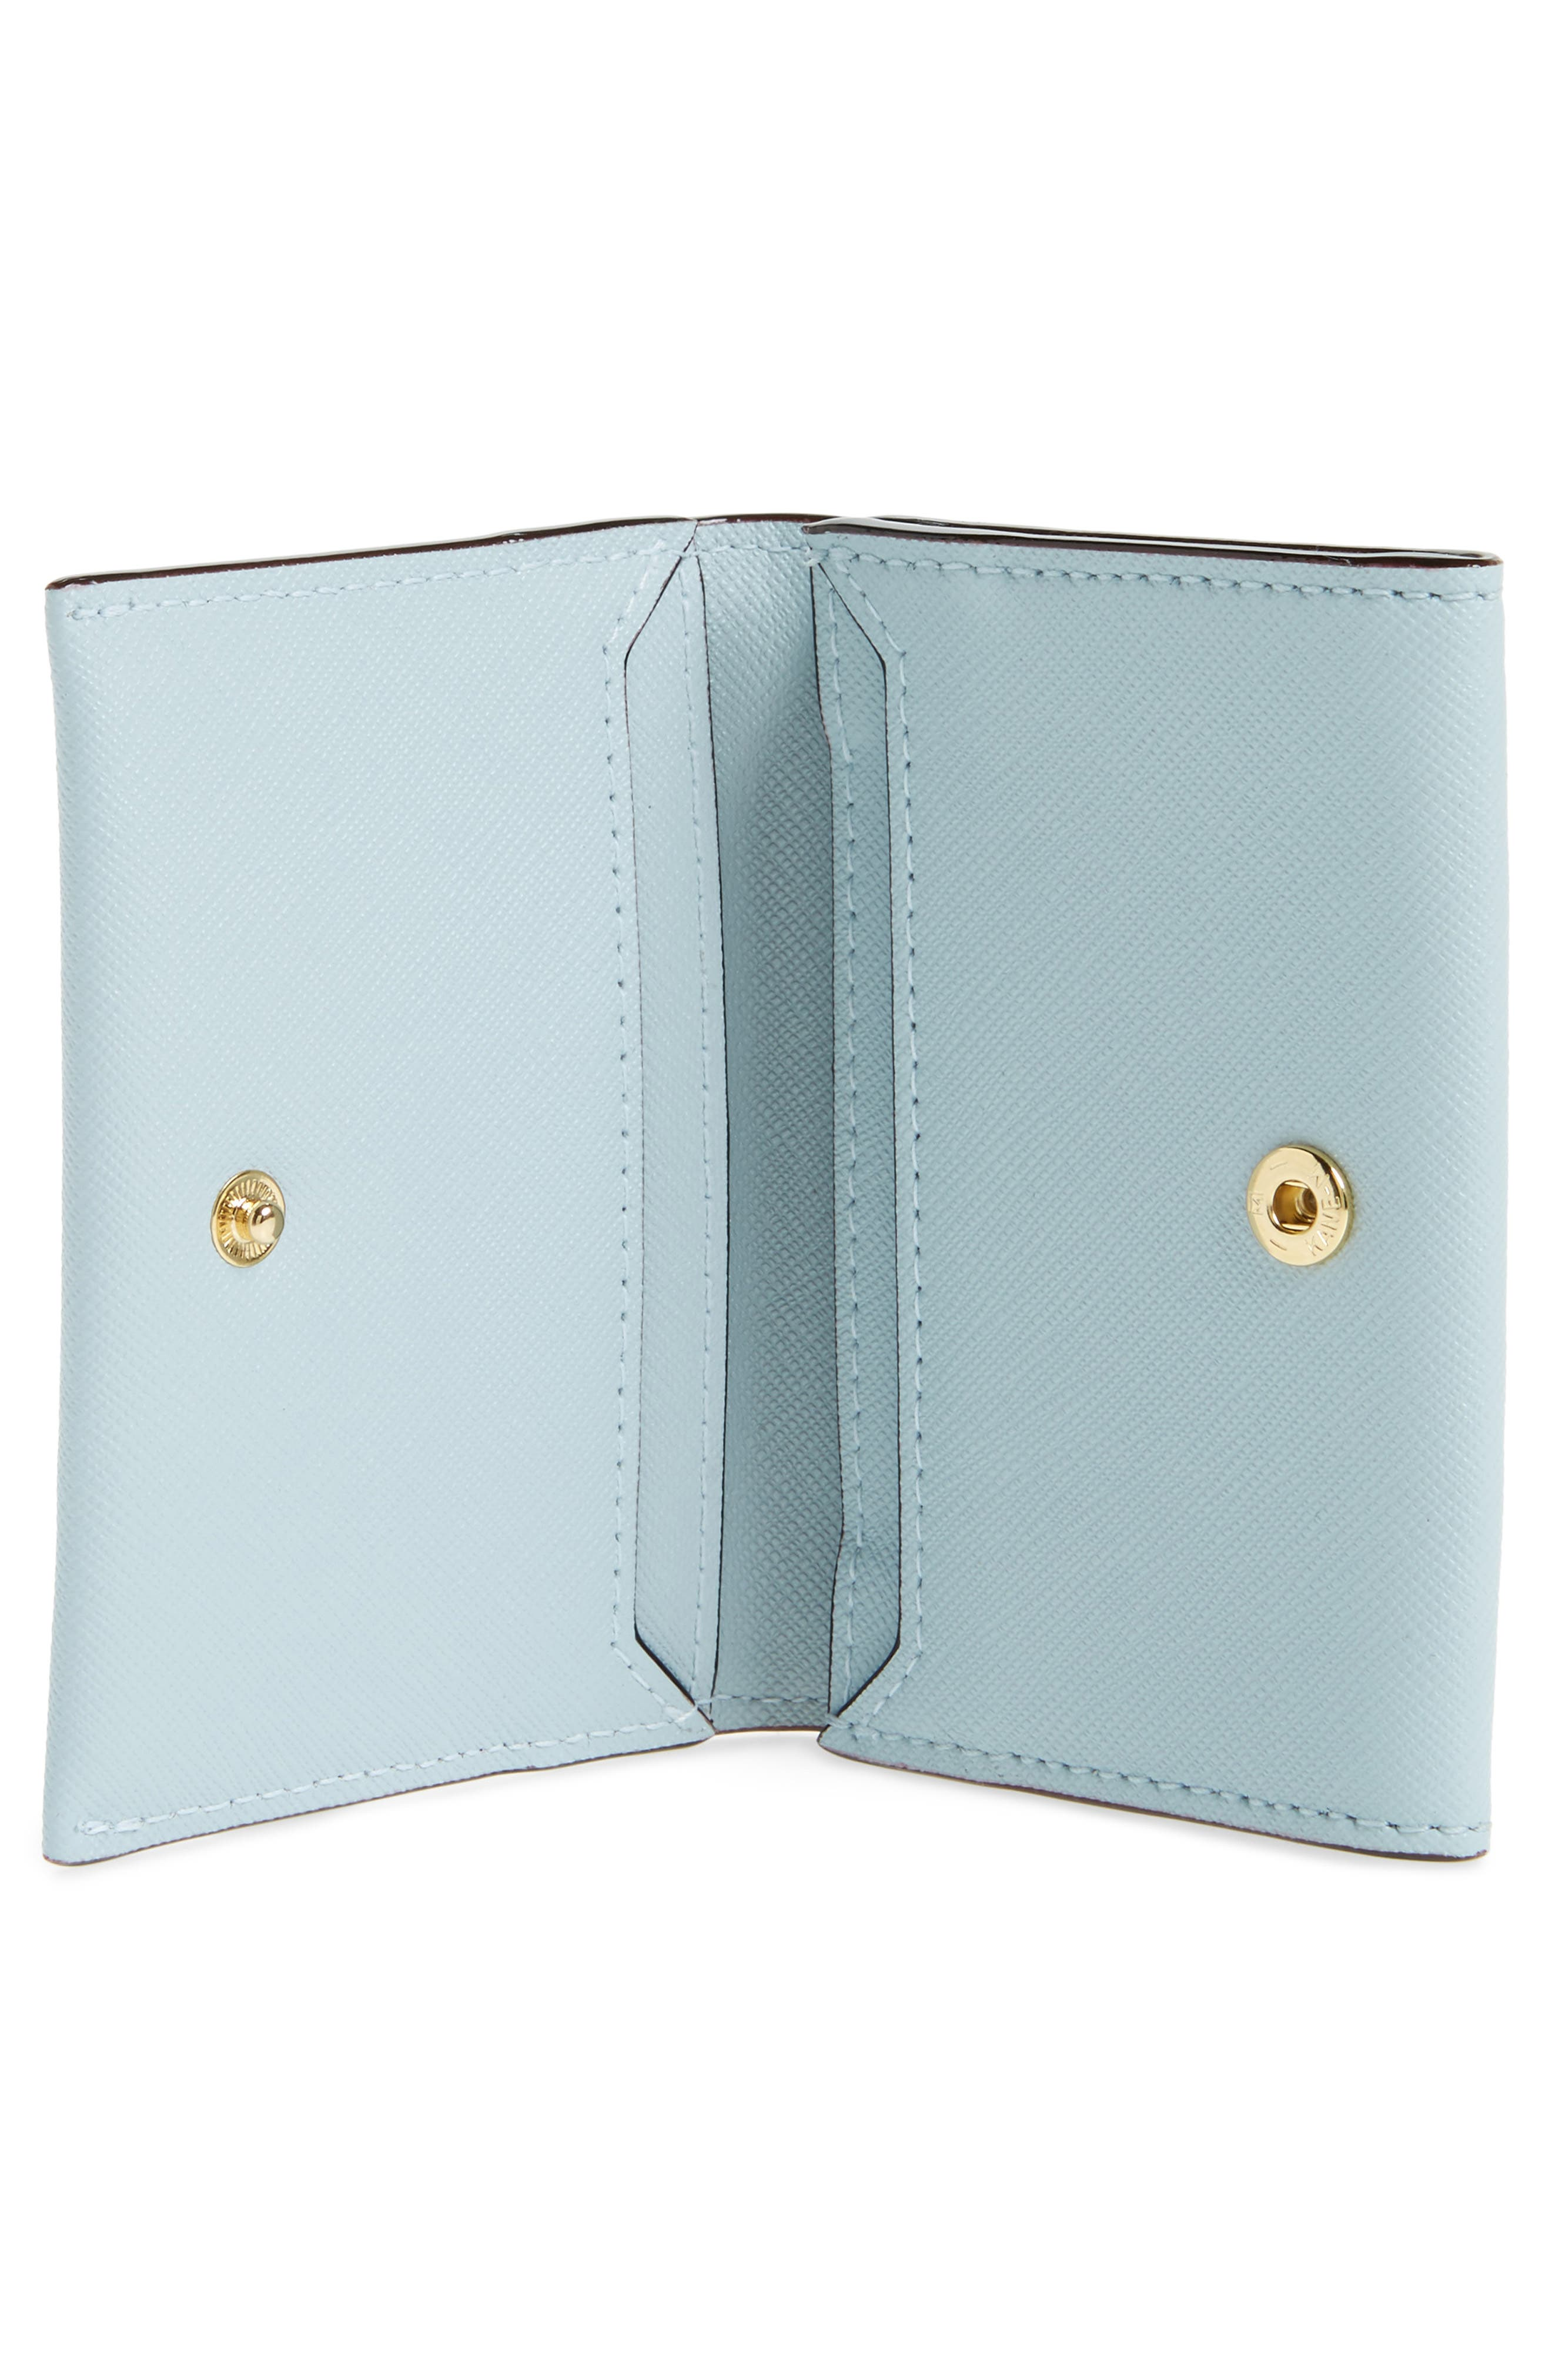 cameron street - farren leather card case,                             Alternate thumbnail 6, color,